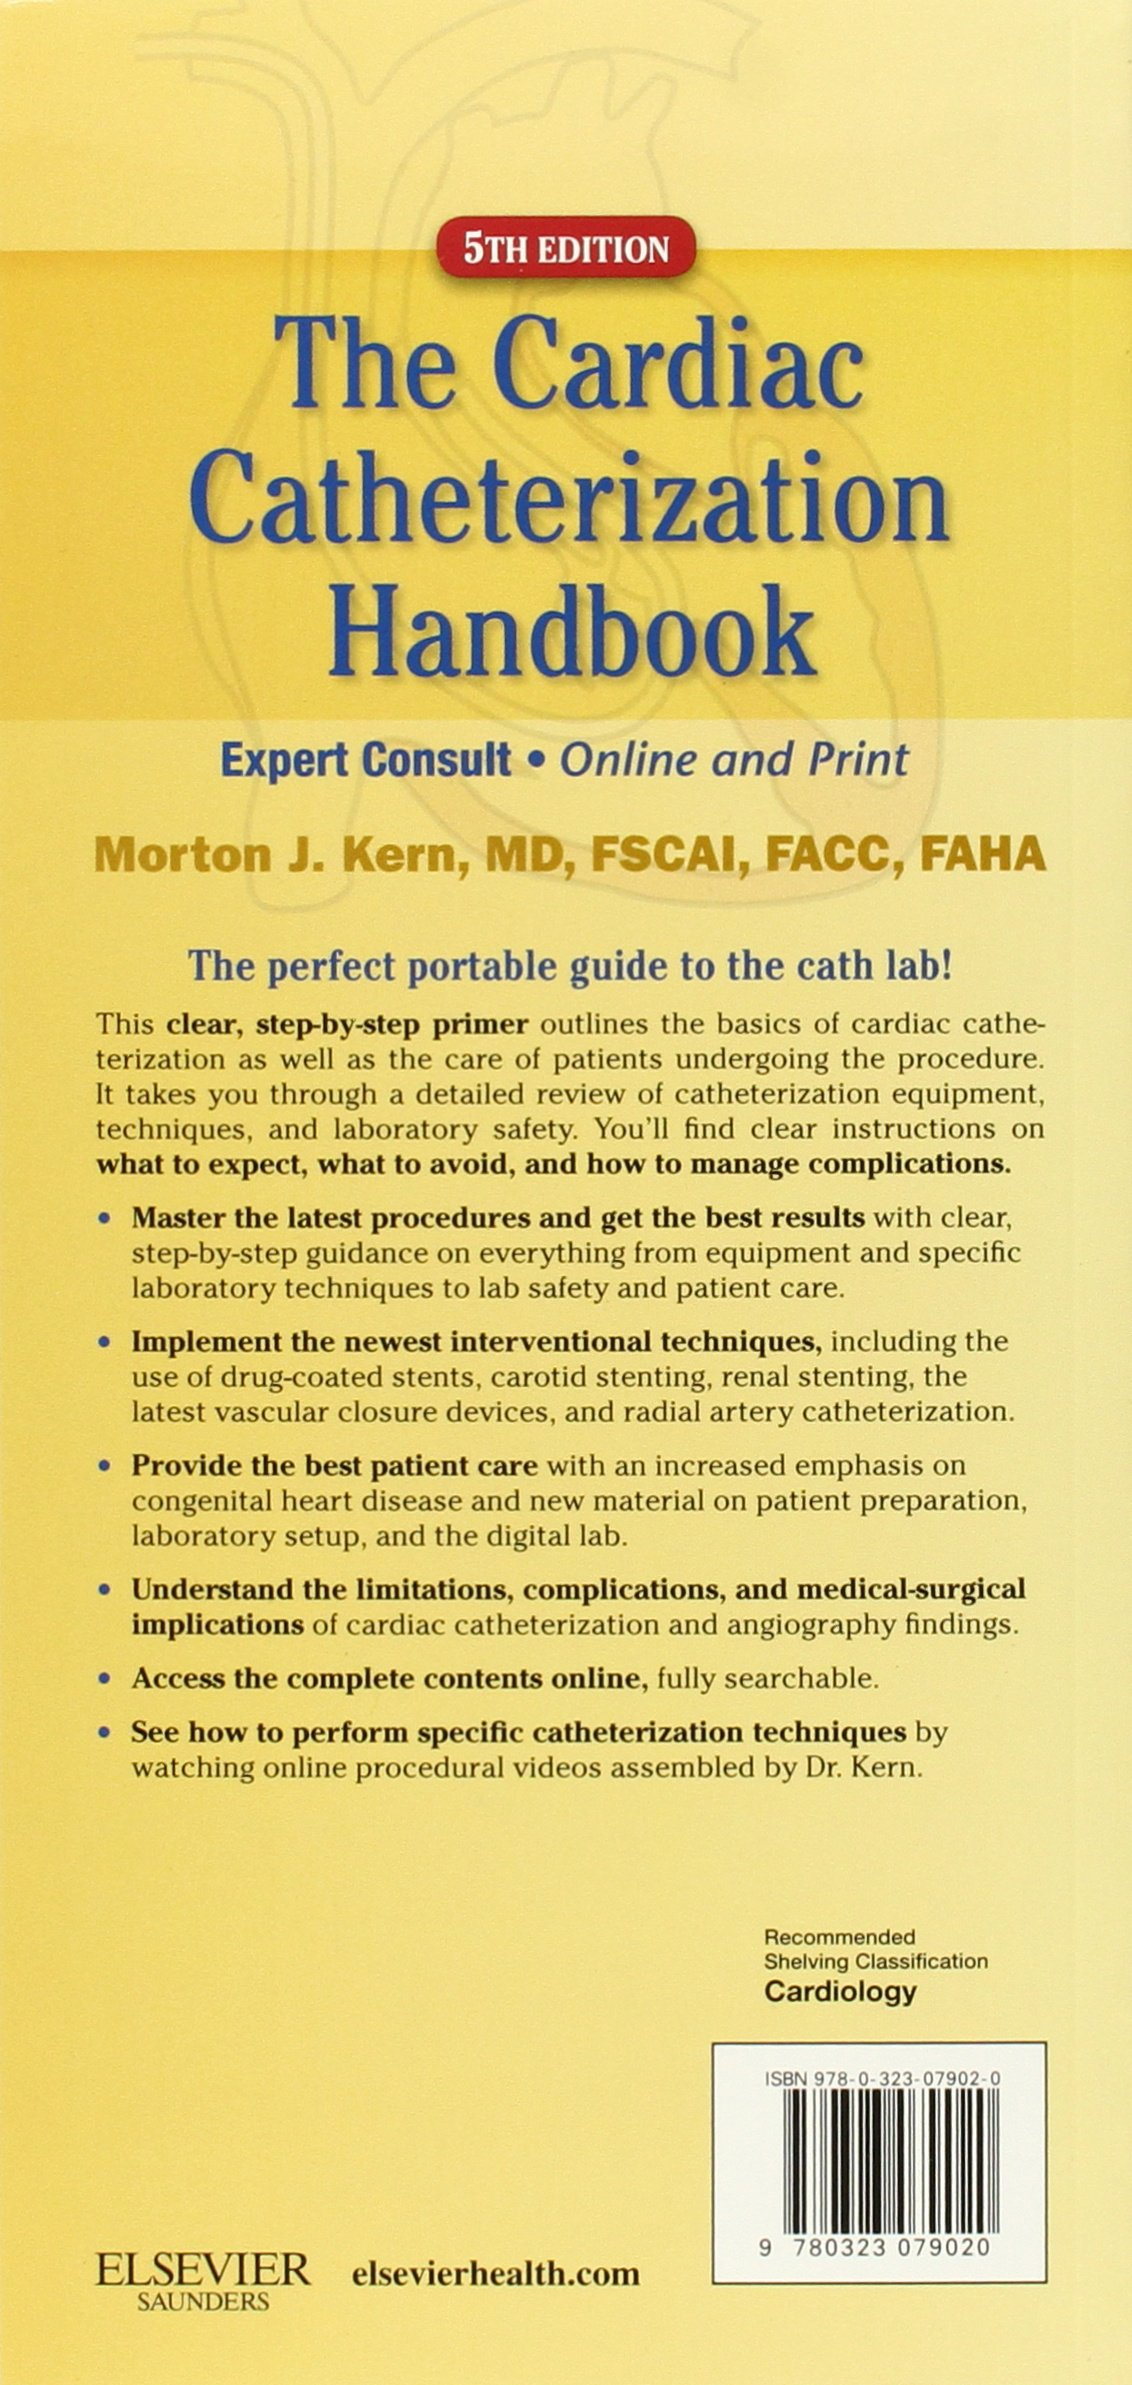 Buy Cardiac Catheterization Handbook: Expert Consult - Online and ...